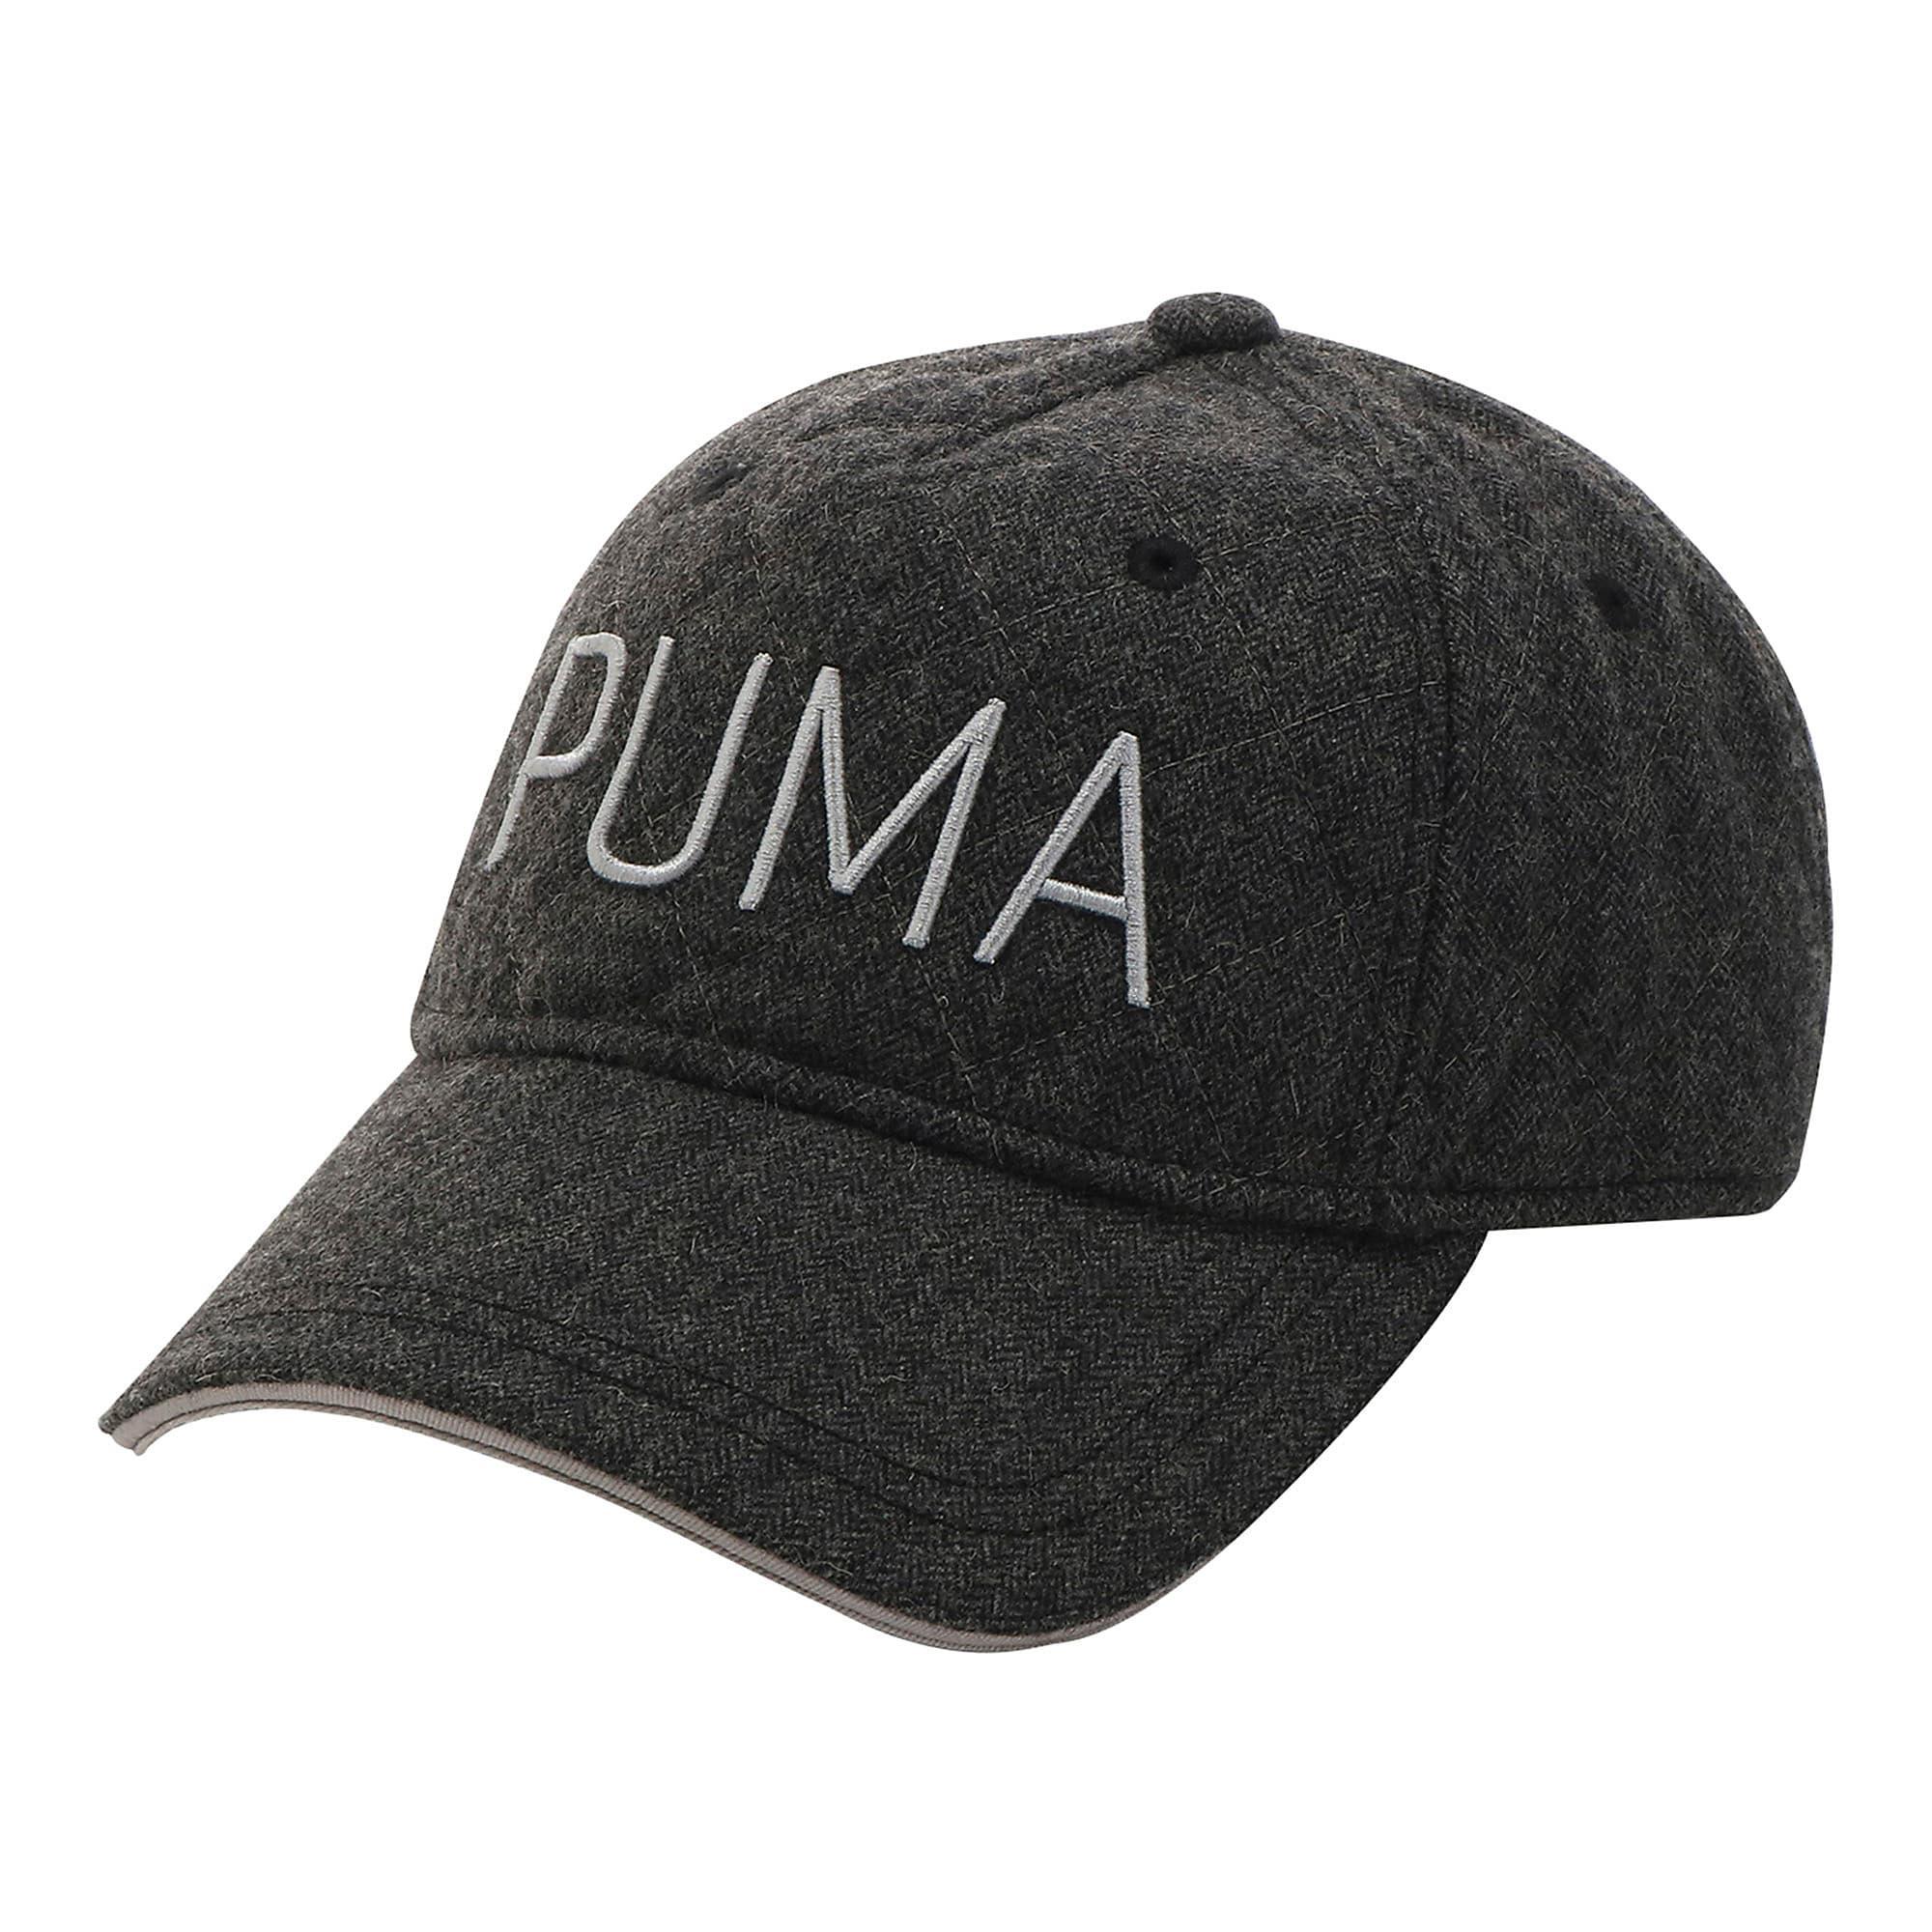 Thumbnail 1 of ゴルフ キルト キャップ, Puma Black, medium-JPN